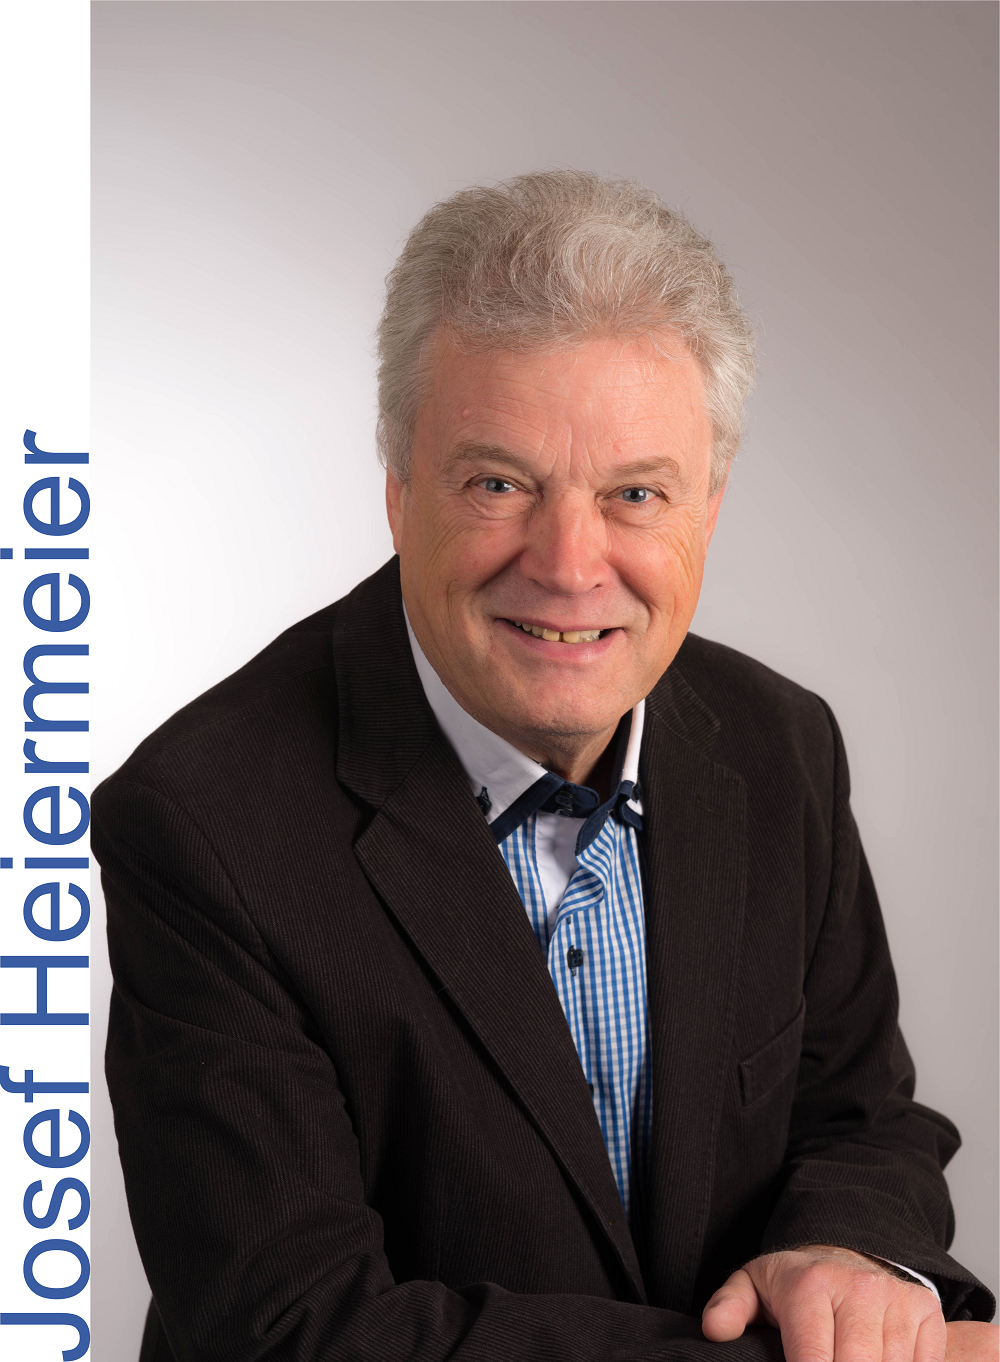 Josef Heiermeier